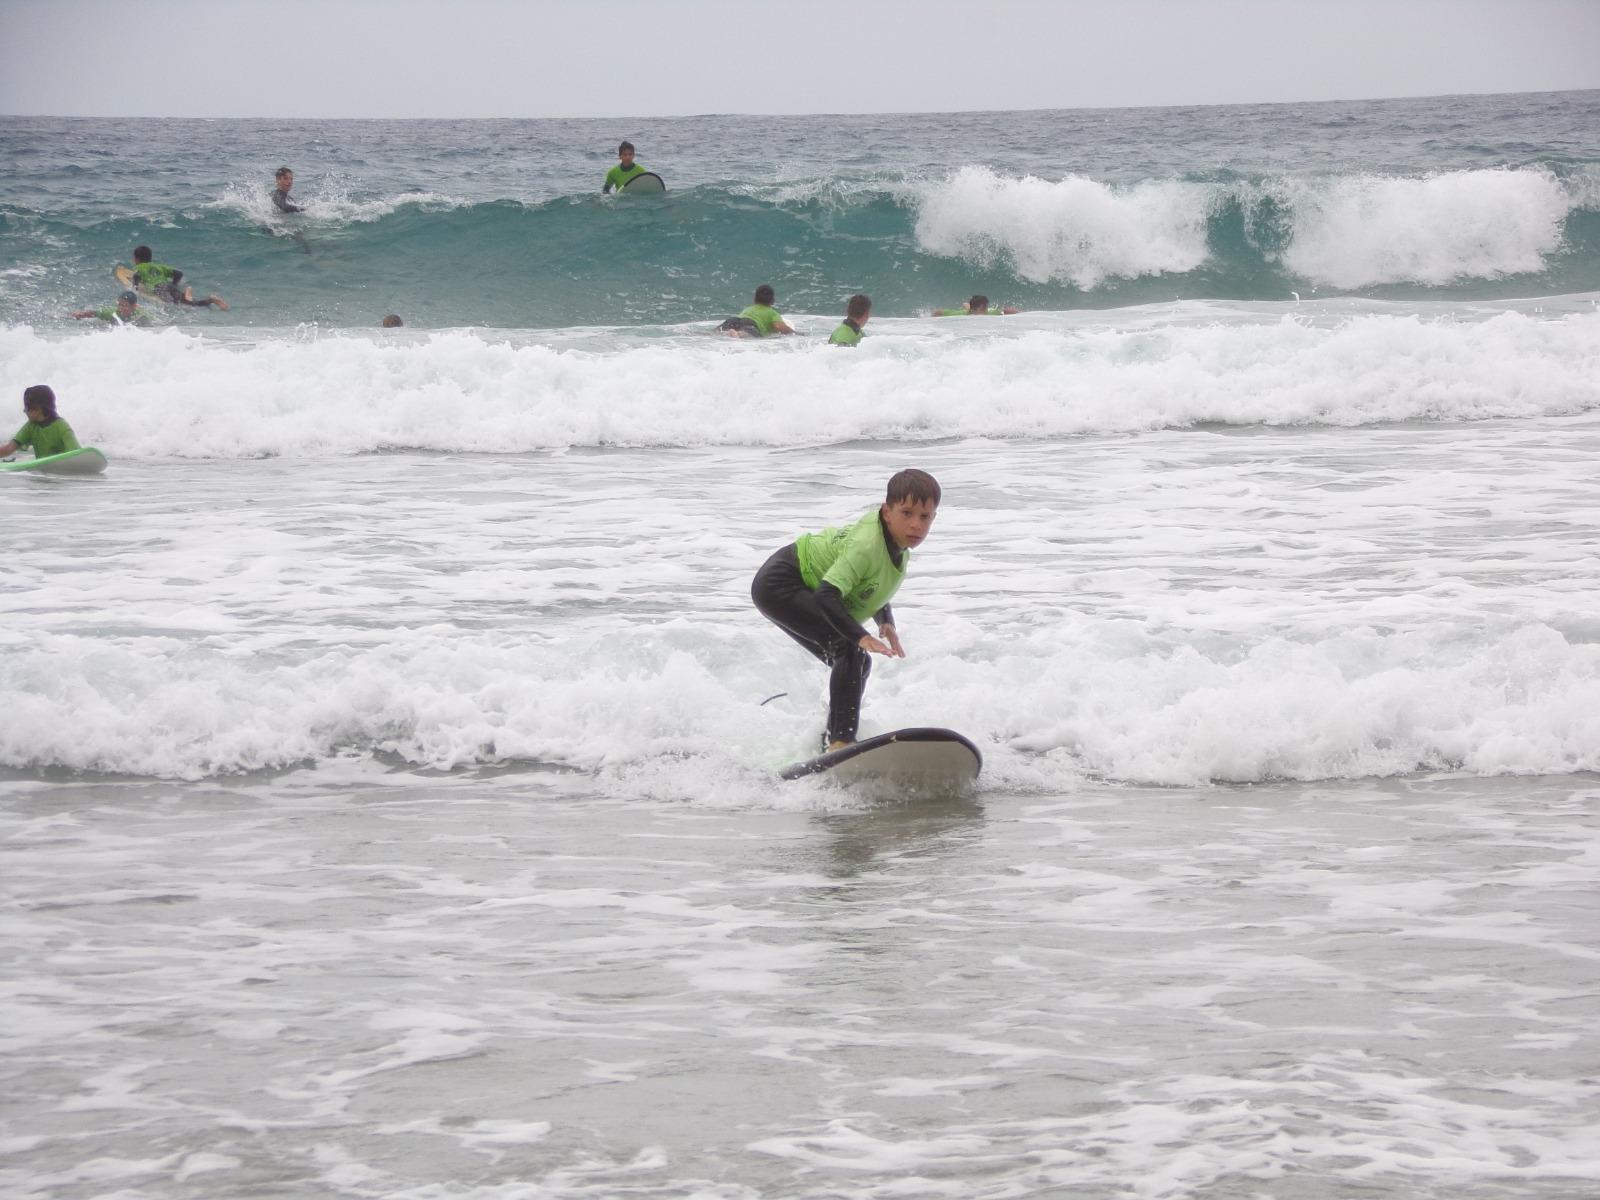 VERANO 2019 FUERTE TRIBU SURFWhatsApp Image 2019-07-21 at 22.23.11.jpg